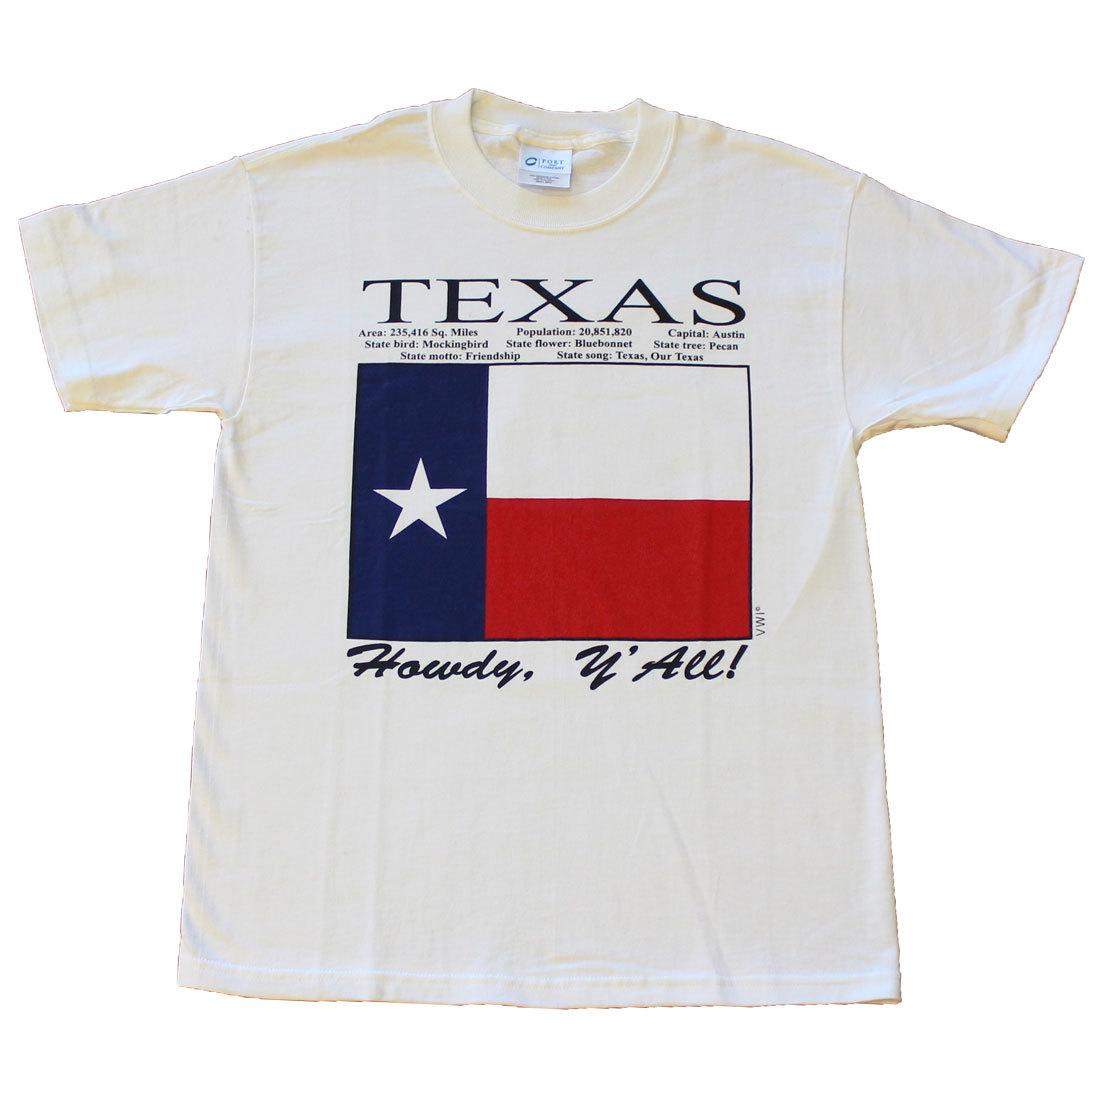 Texas State T-Shirt (L)